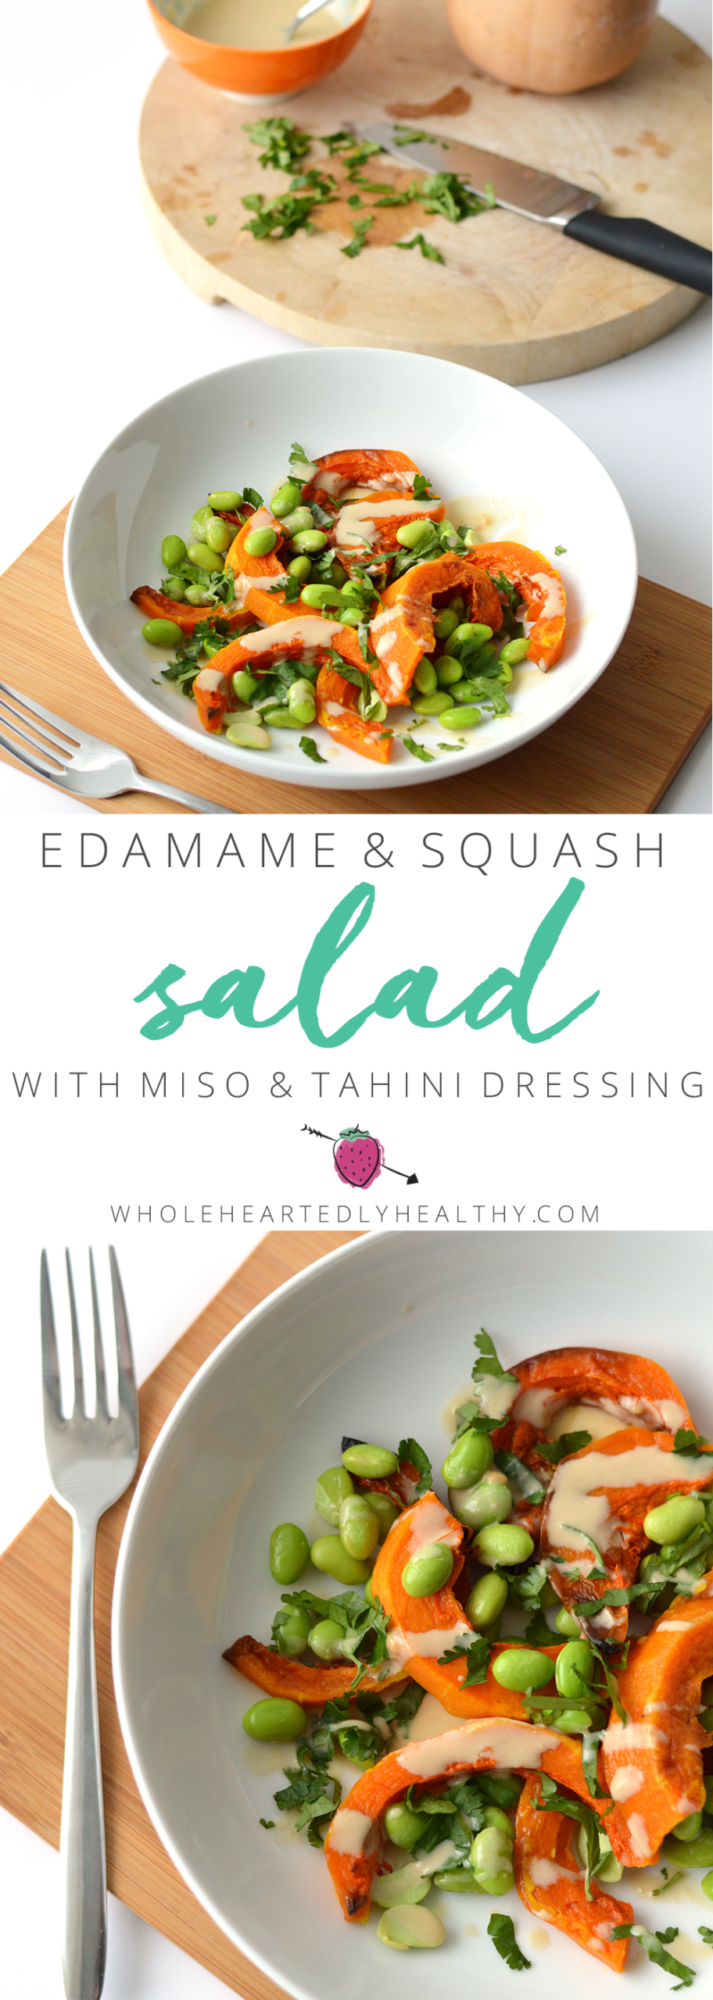 squash and edamame salad